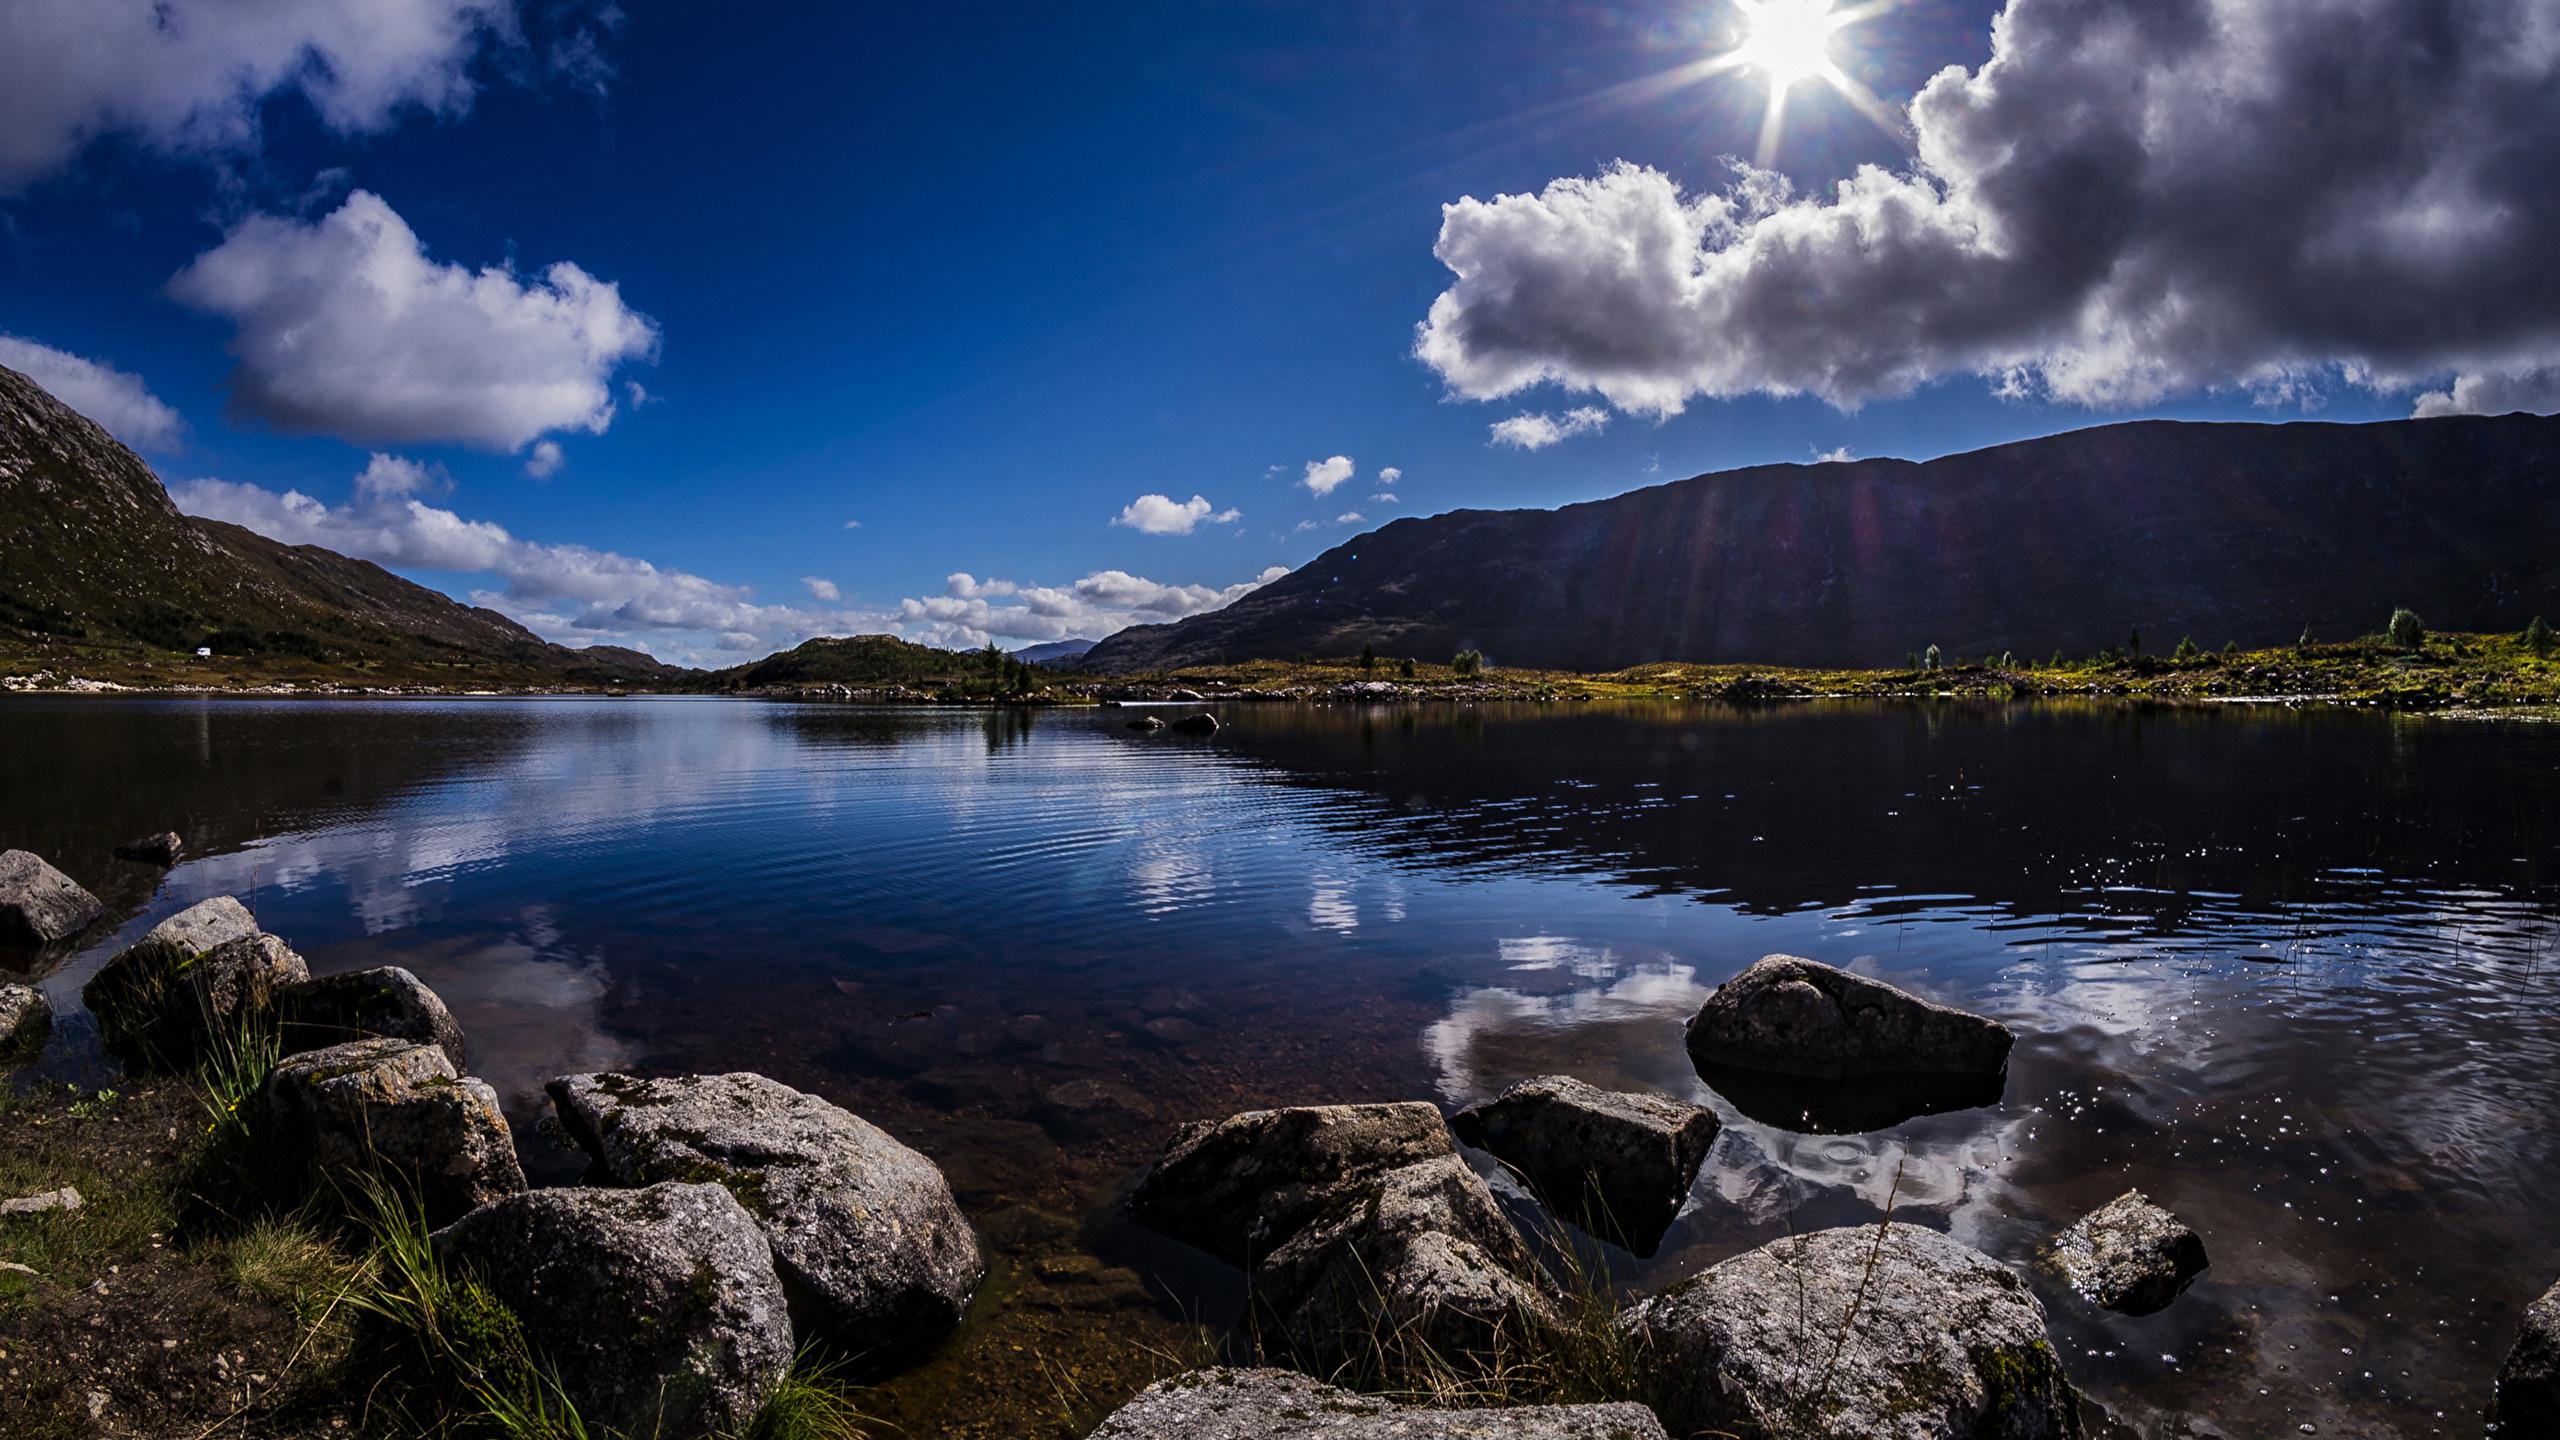 Картинка Шотландия Achallader гора солнца Природа Озеро Камни облачно 2560x1440 Горы Солнце Камень облако Облака